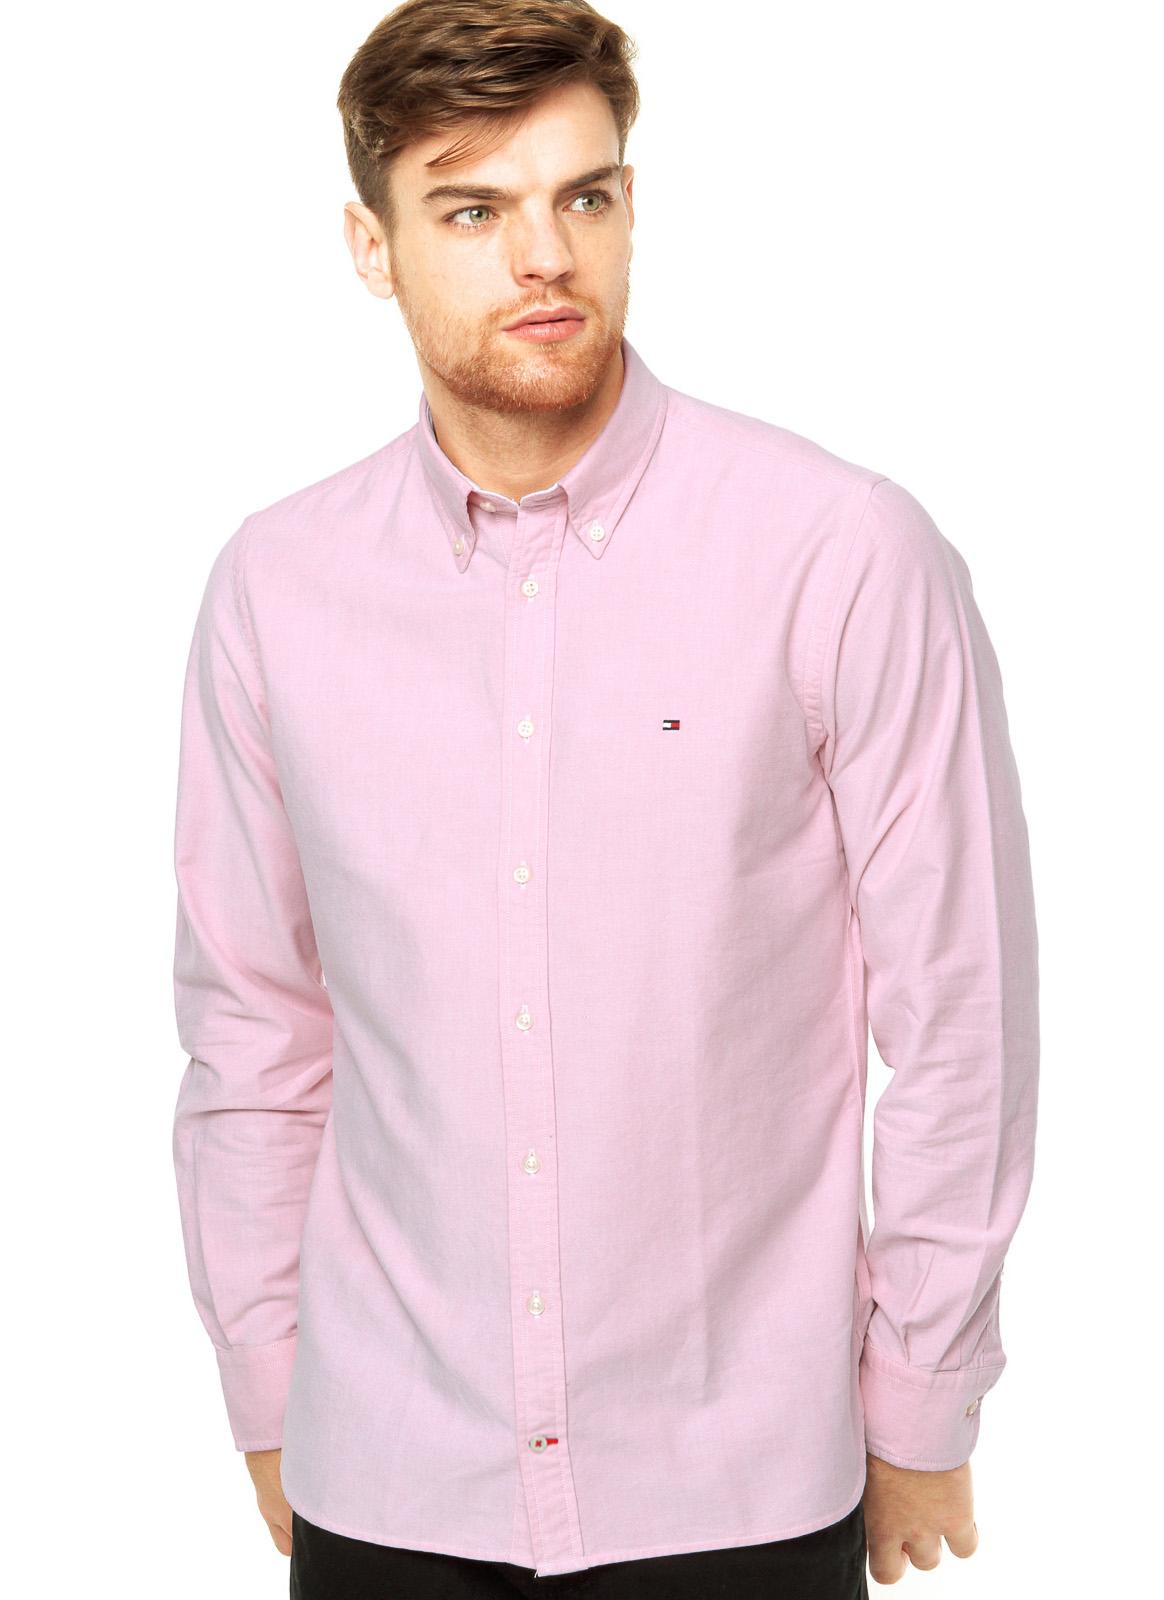 Camisa Tommy Hilfiger Masculina Regular Fit Cotton Oxford Rosa